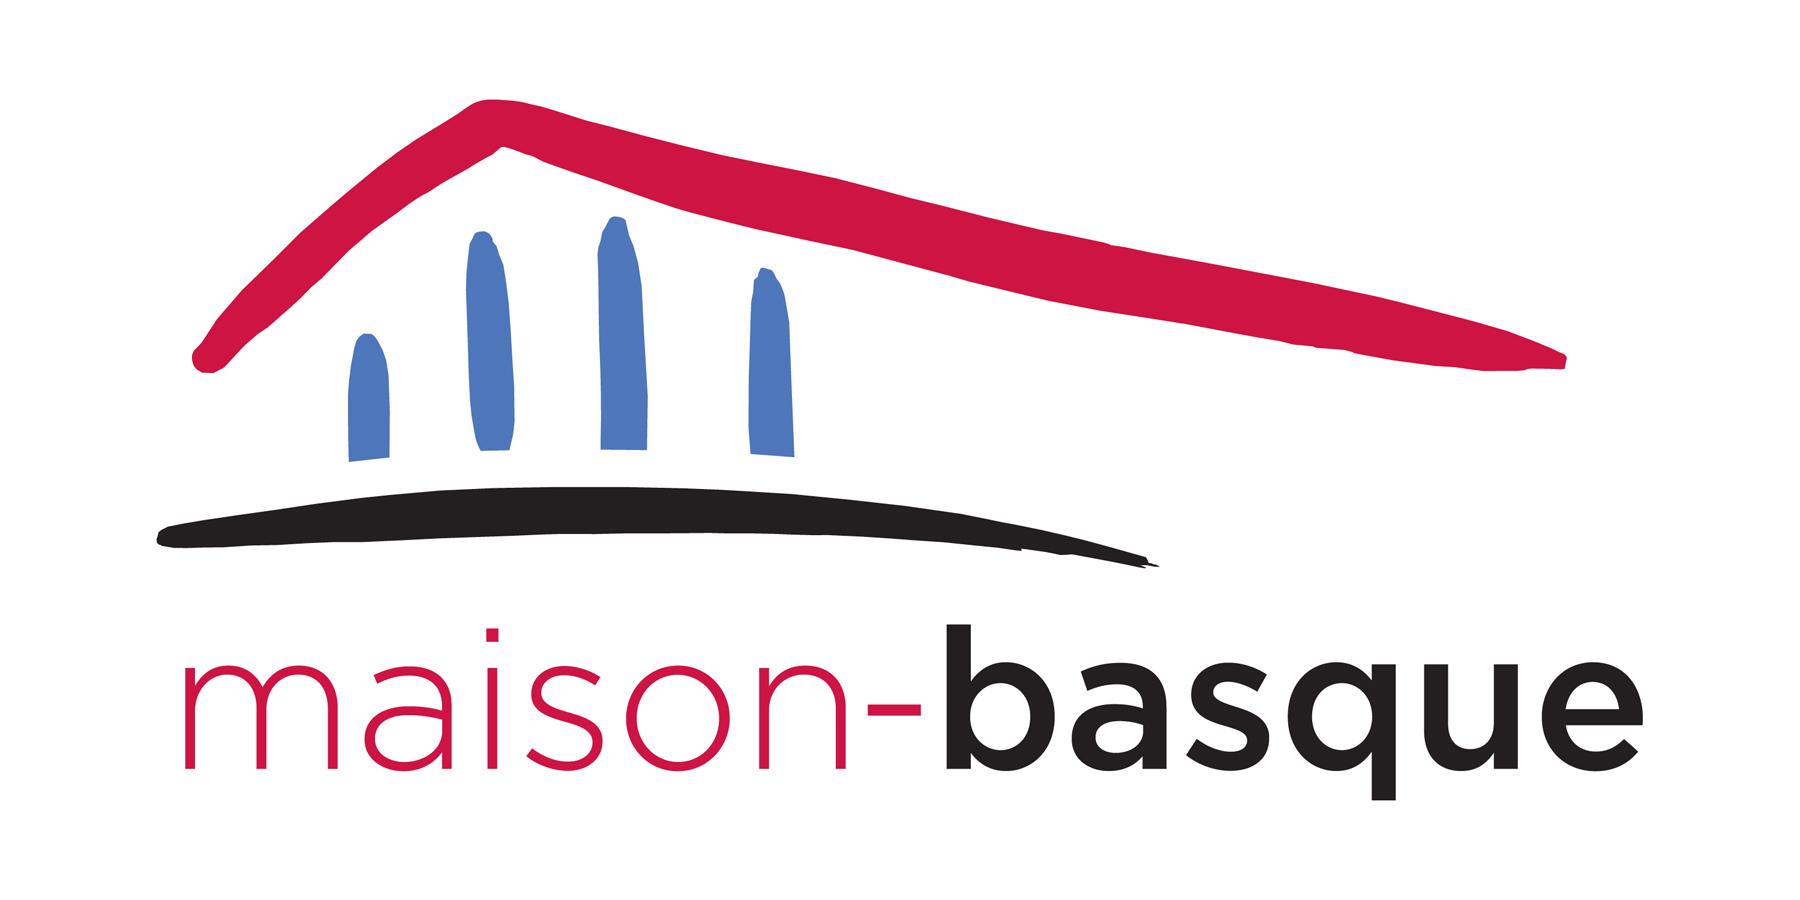 maison-basque_logoƒ_RED-BLUE-BLACK.jpg